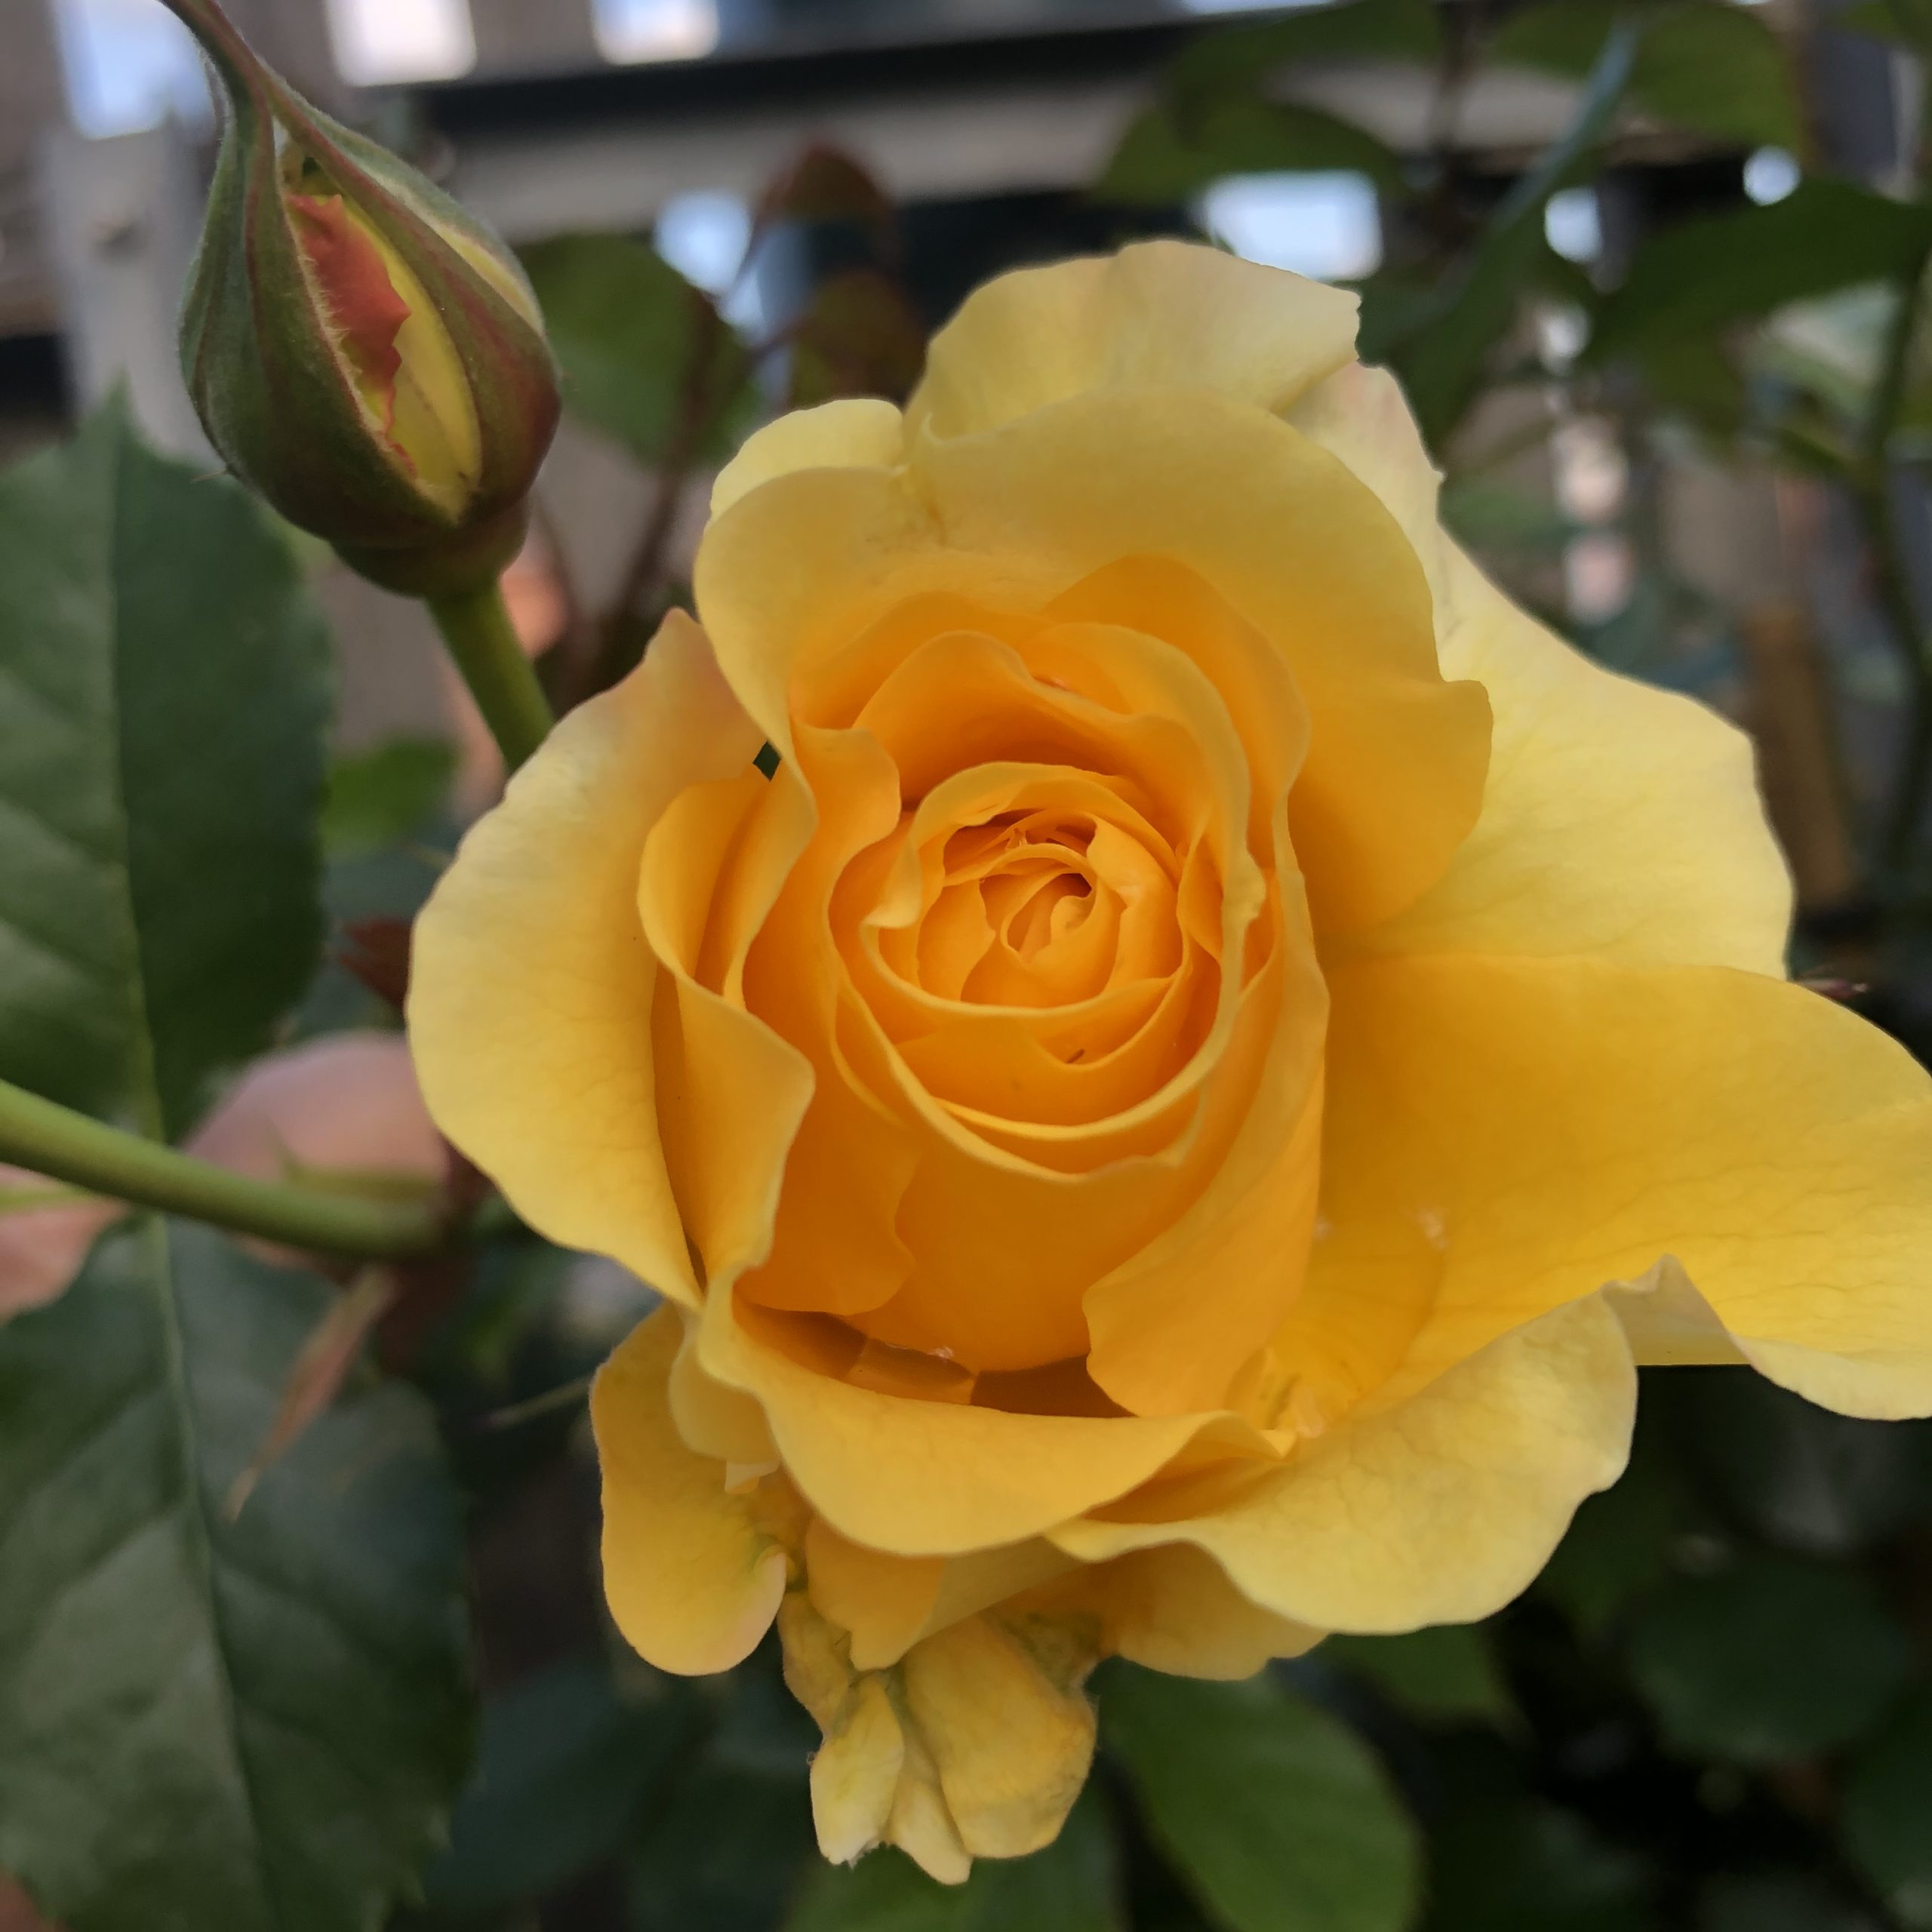 Rosiers Grosse fleur  Anisade 4 litres